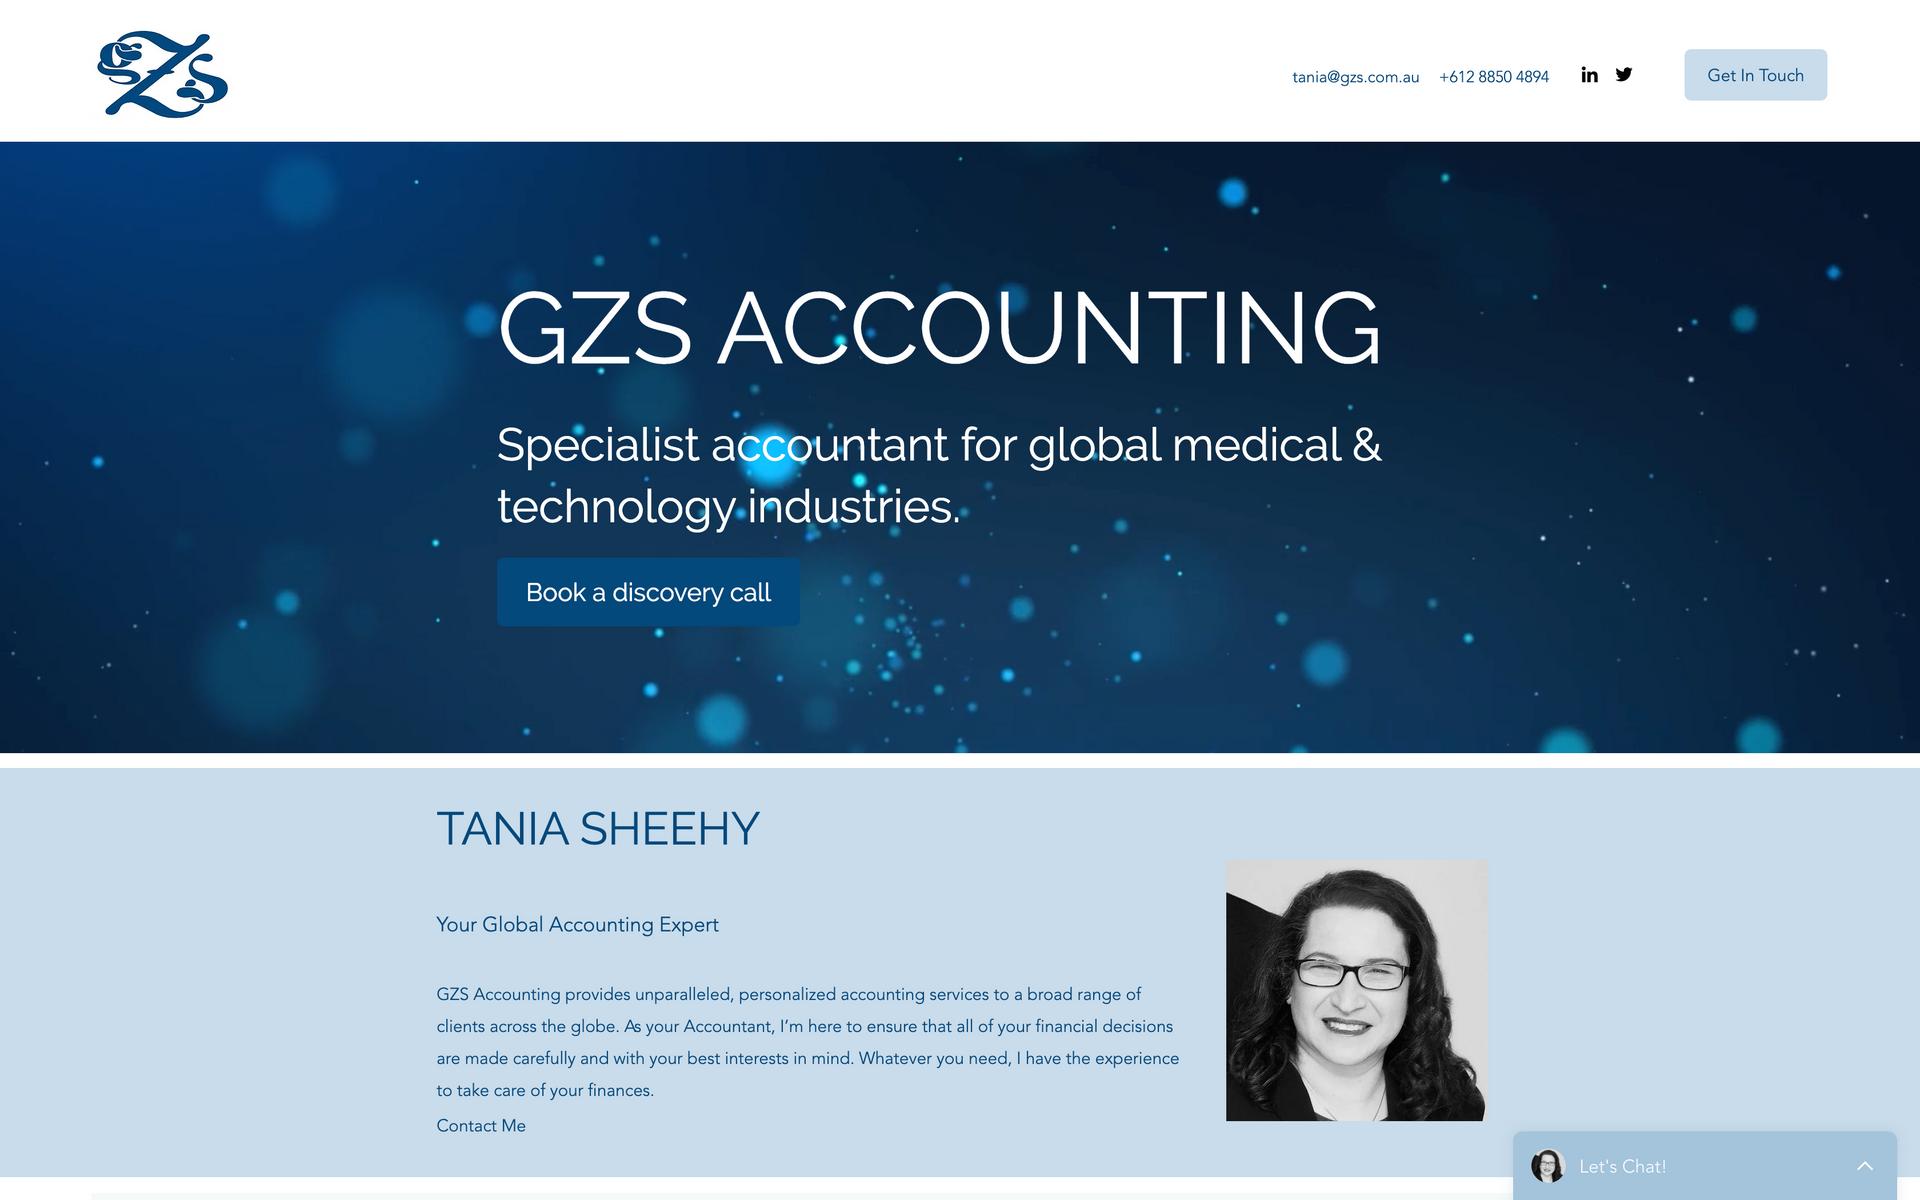 GZS ACCOUNTING